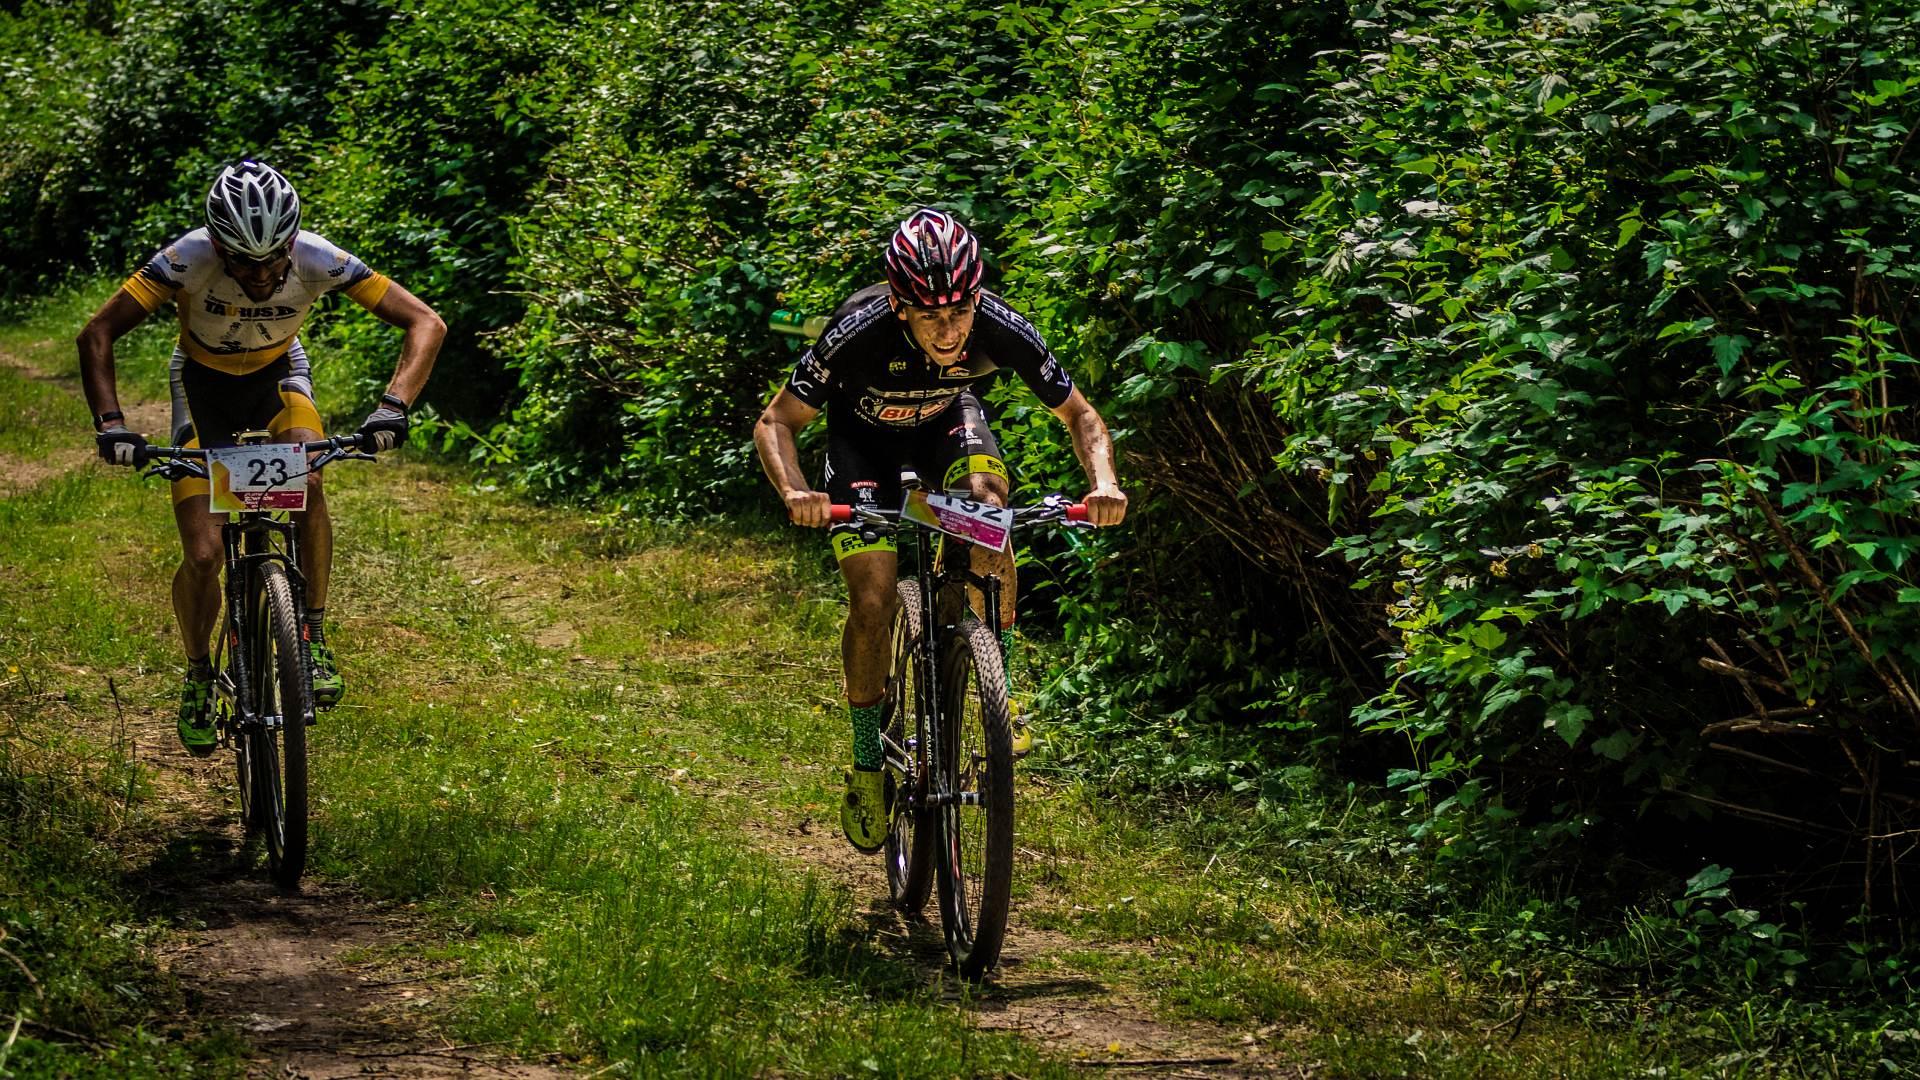 wyscig-rowerow-gorskich-0086